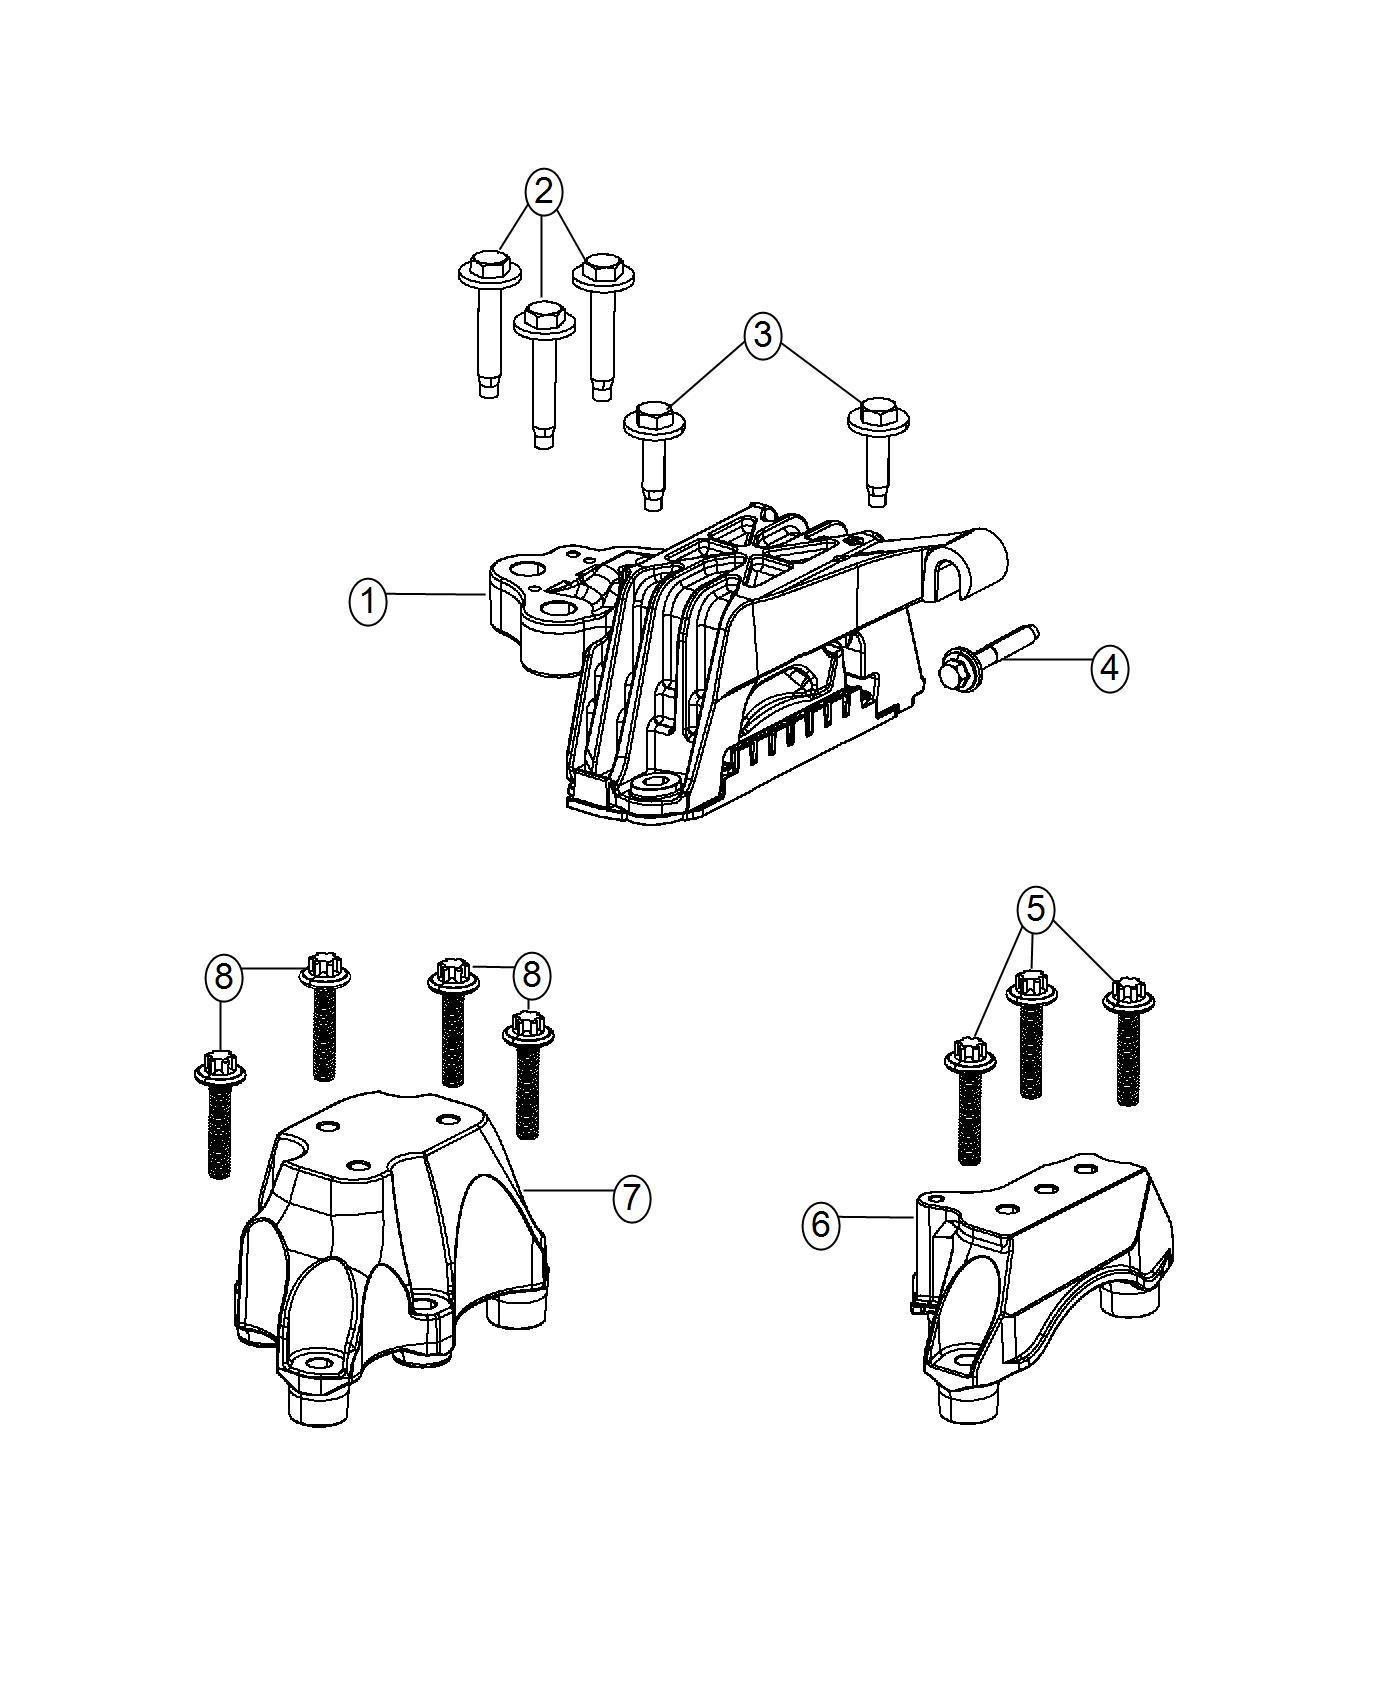 2016 Dodge Dart Insulator, isolator. Engine mount